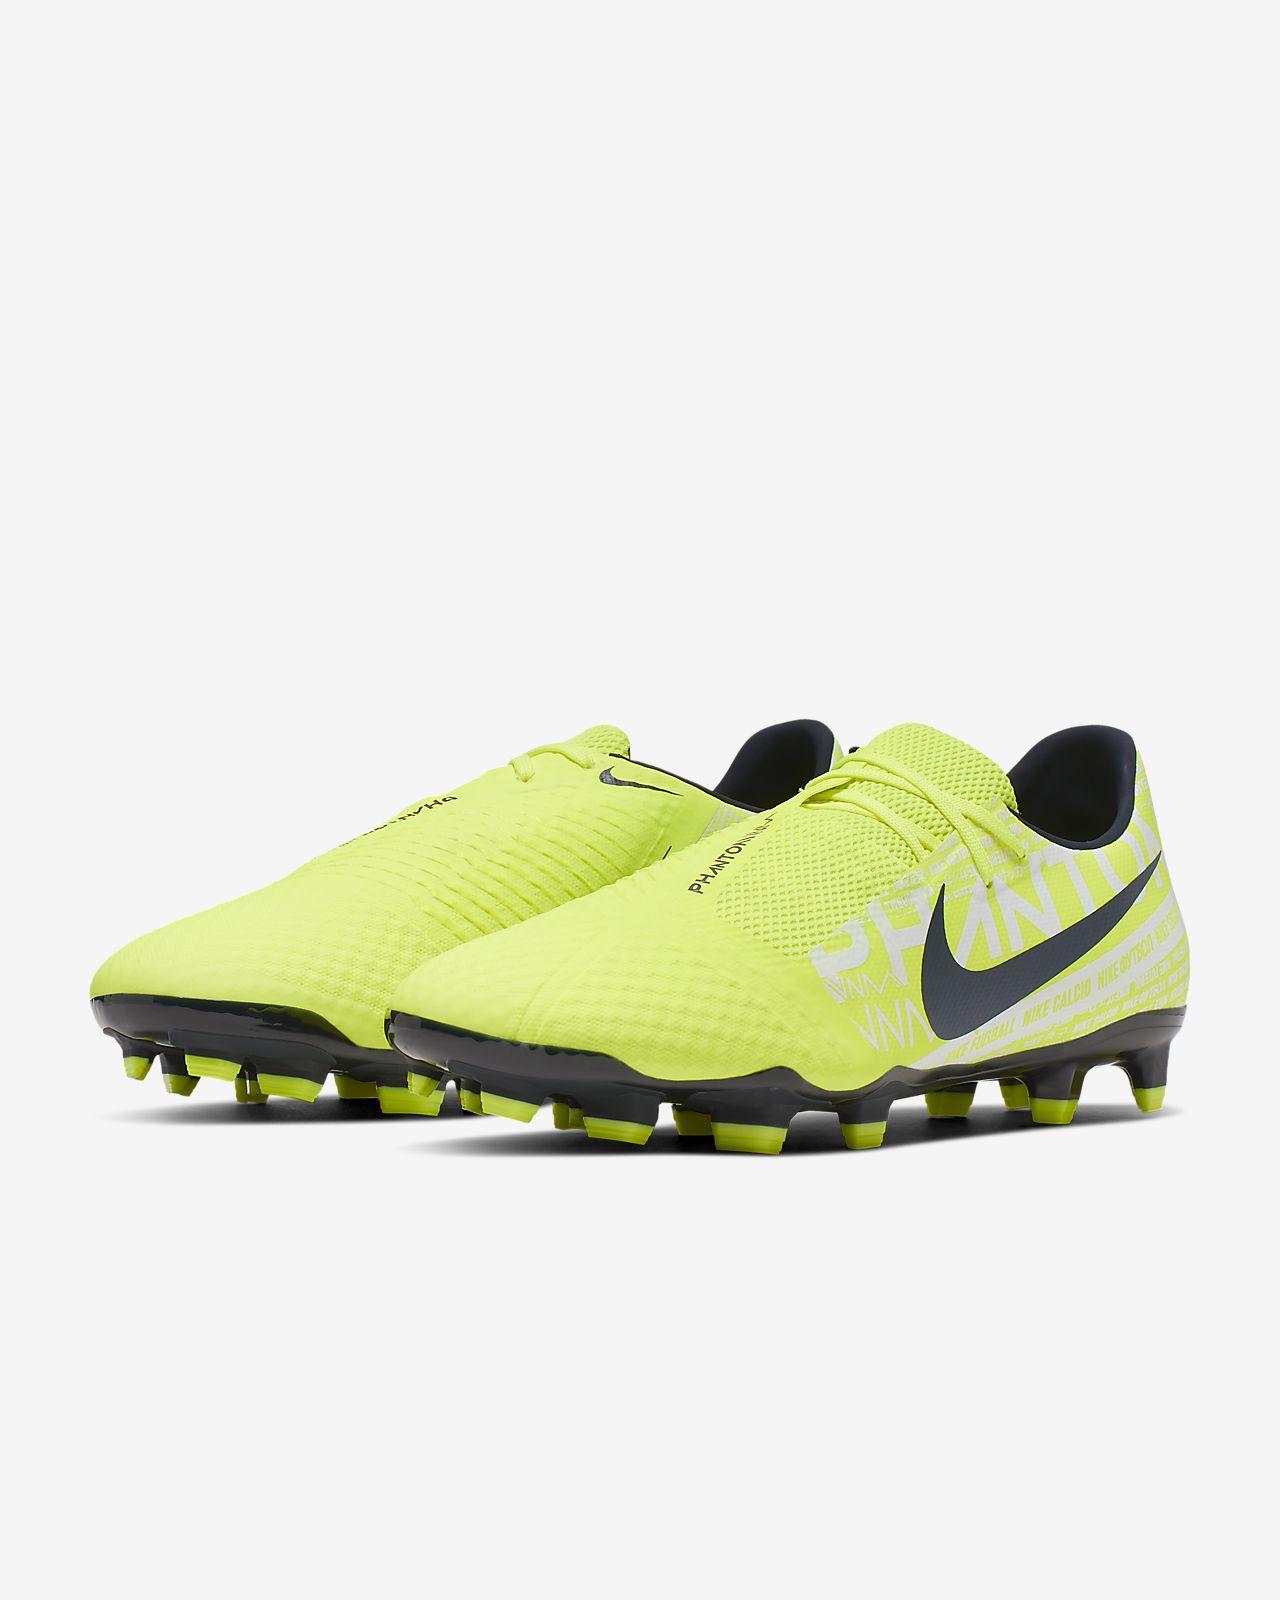 Nike Phantom Venom Academy FG Firm Ground Football Boot